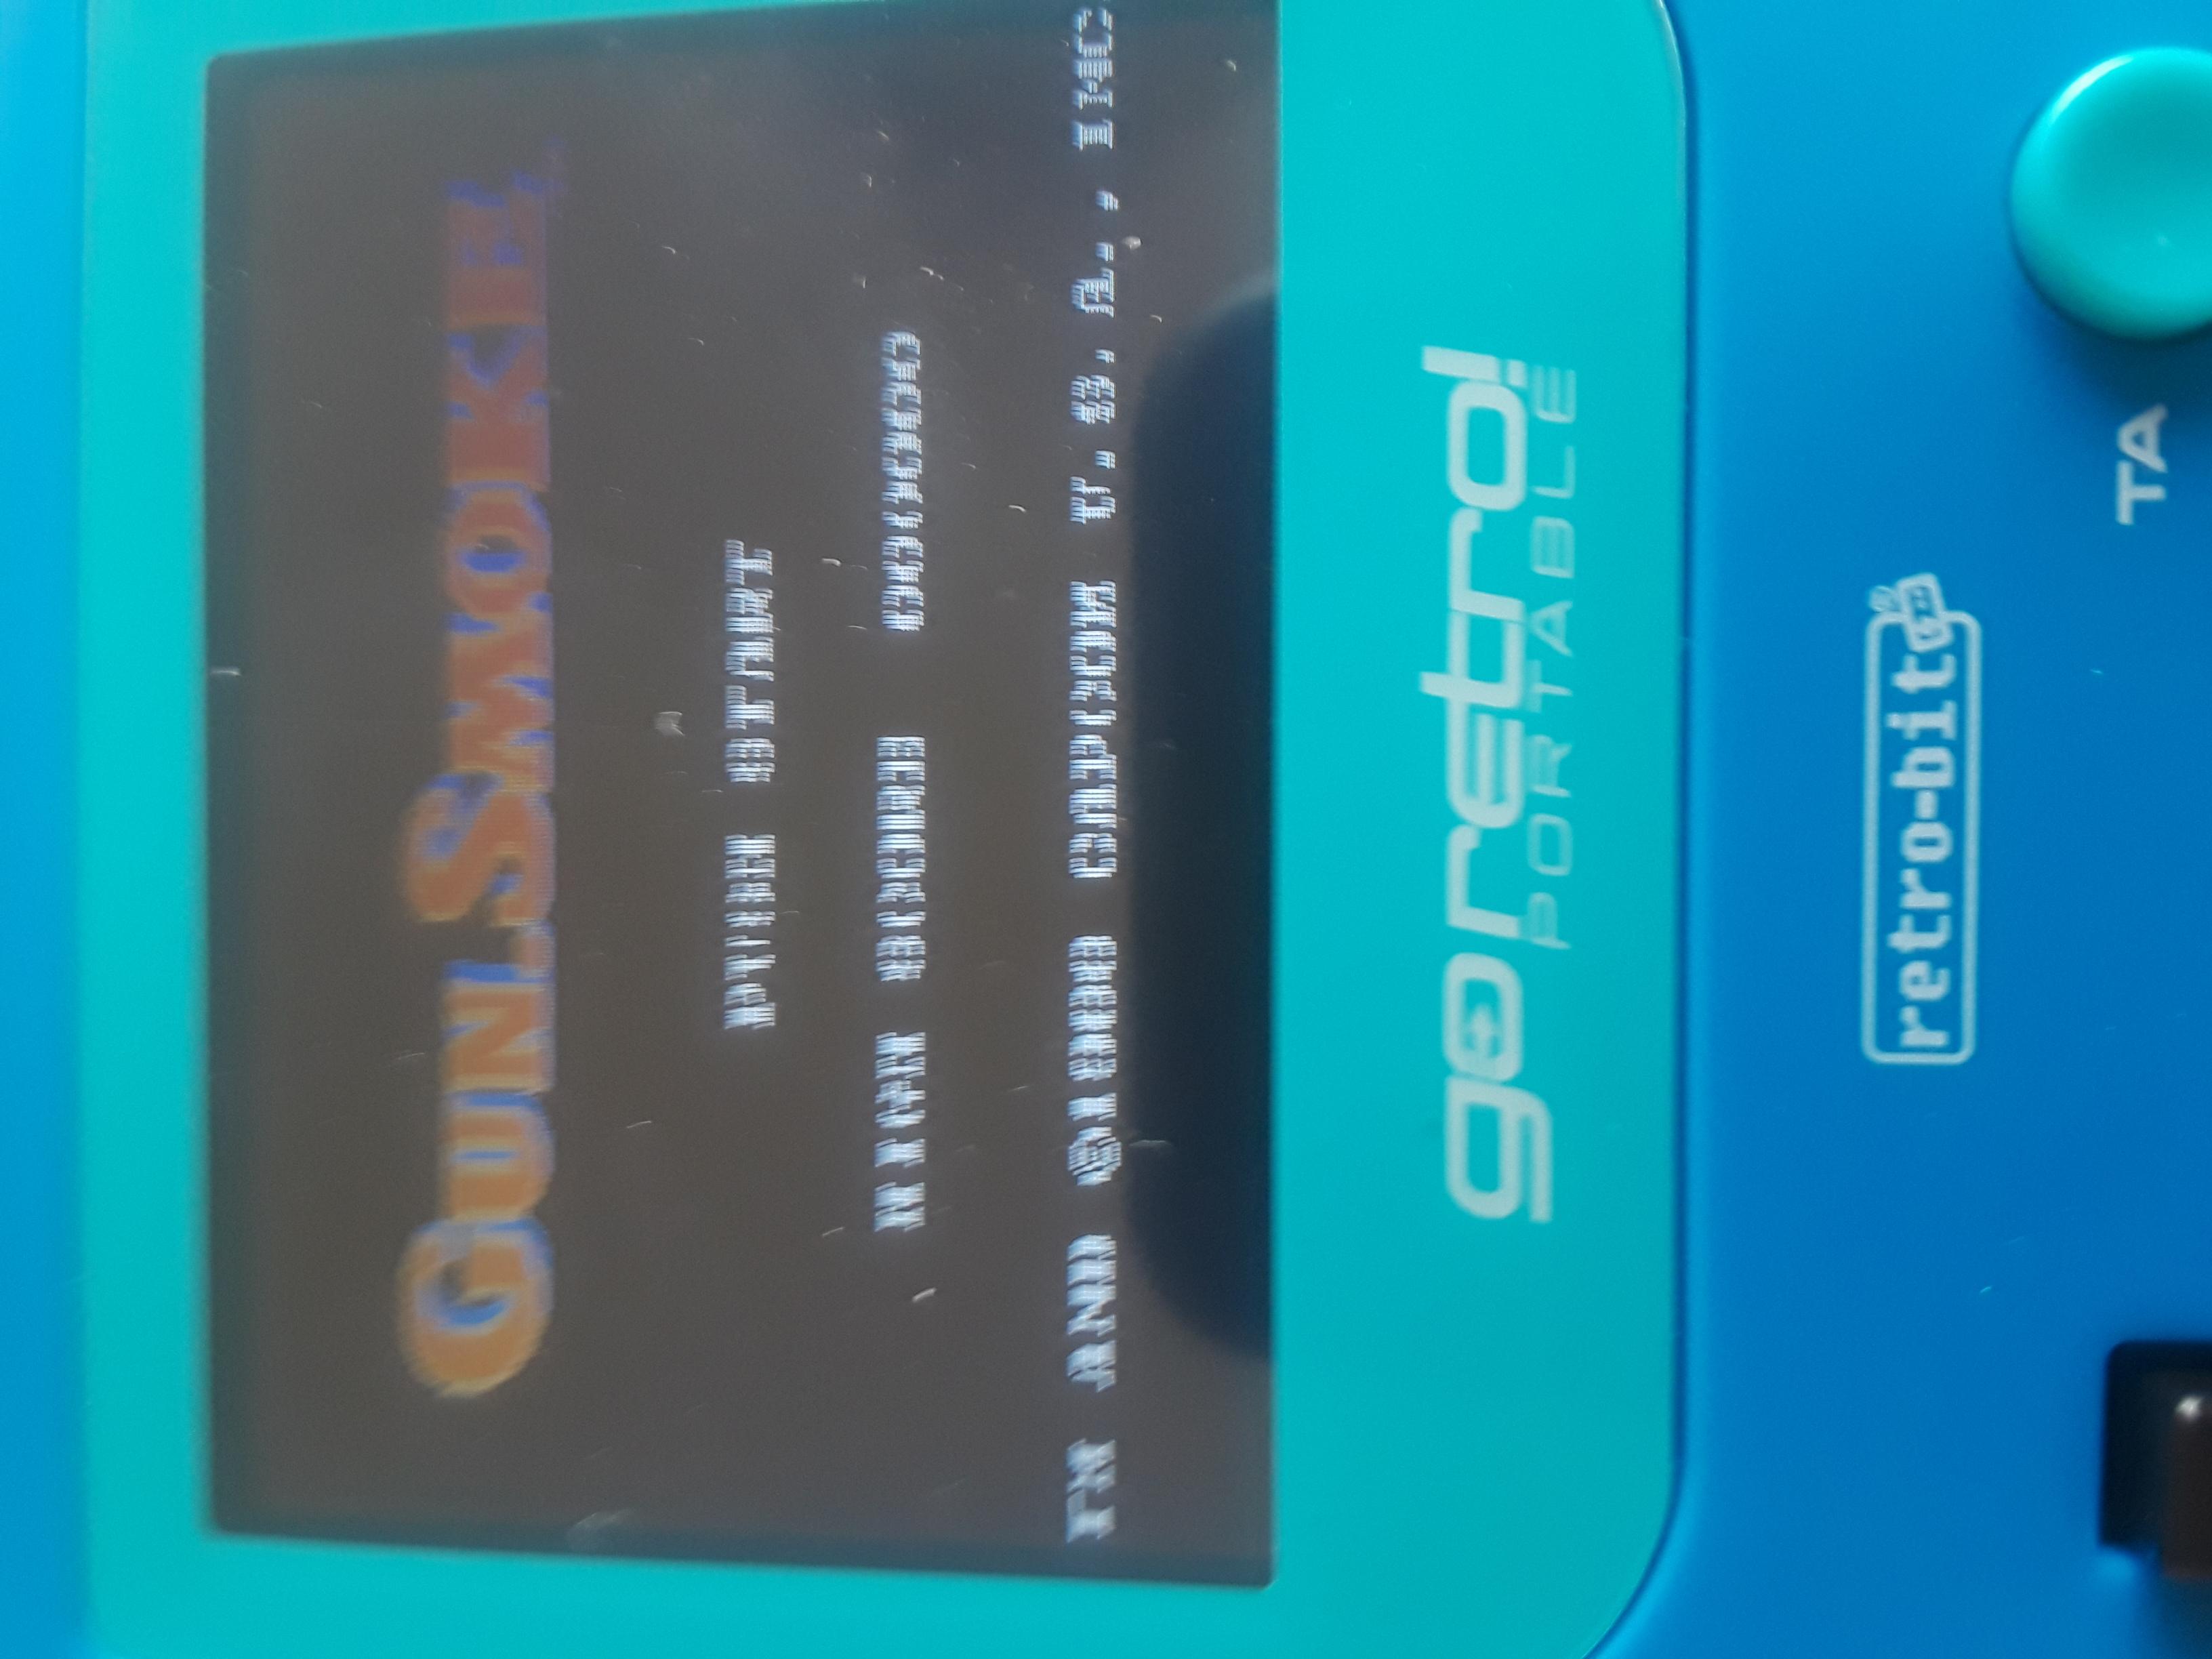 JML101582: Gunsmoke (NES/Famicom Emulated) 5,350 points on 2019-06-03 16:40:29